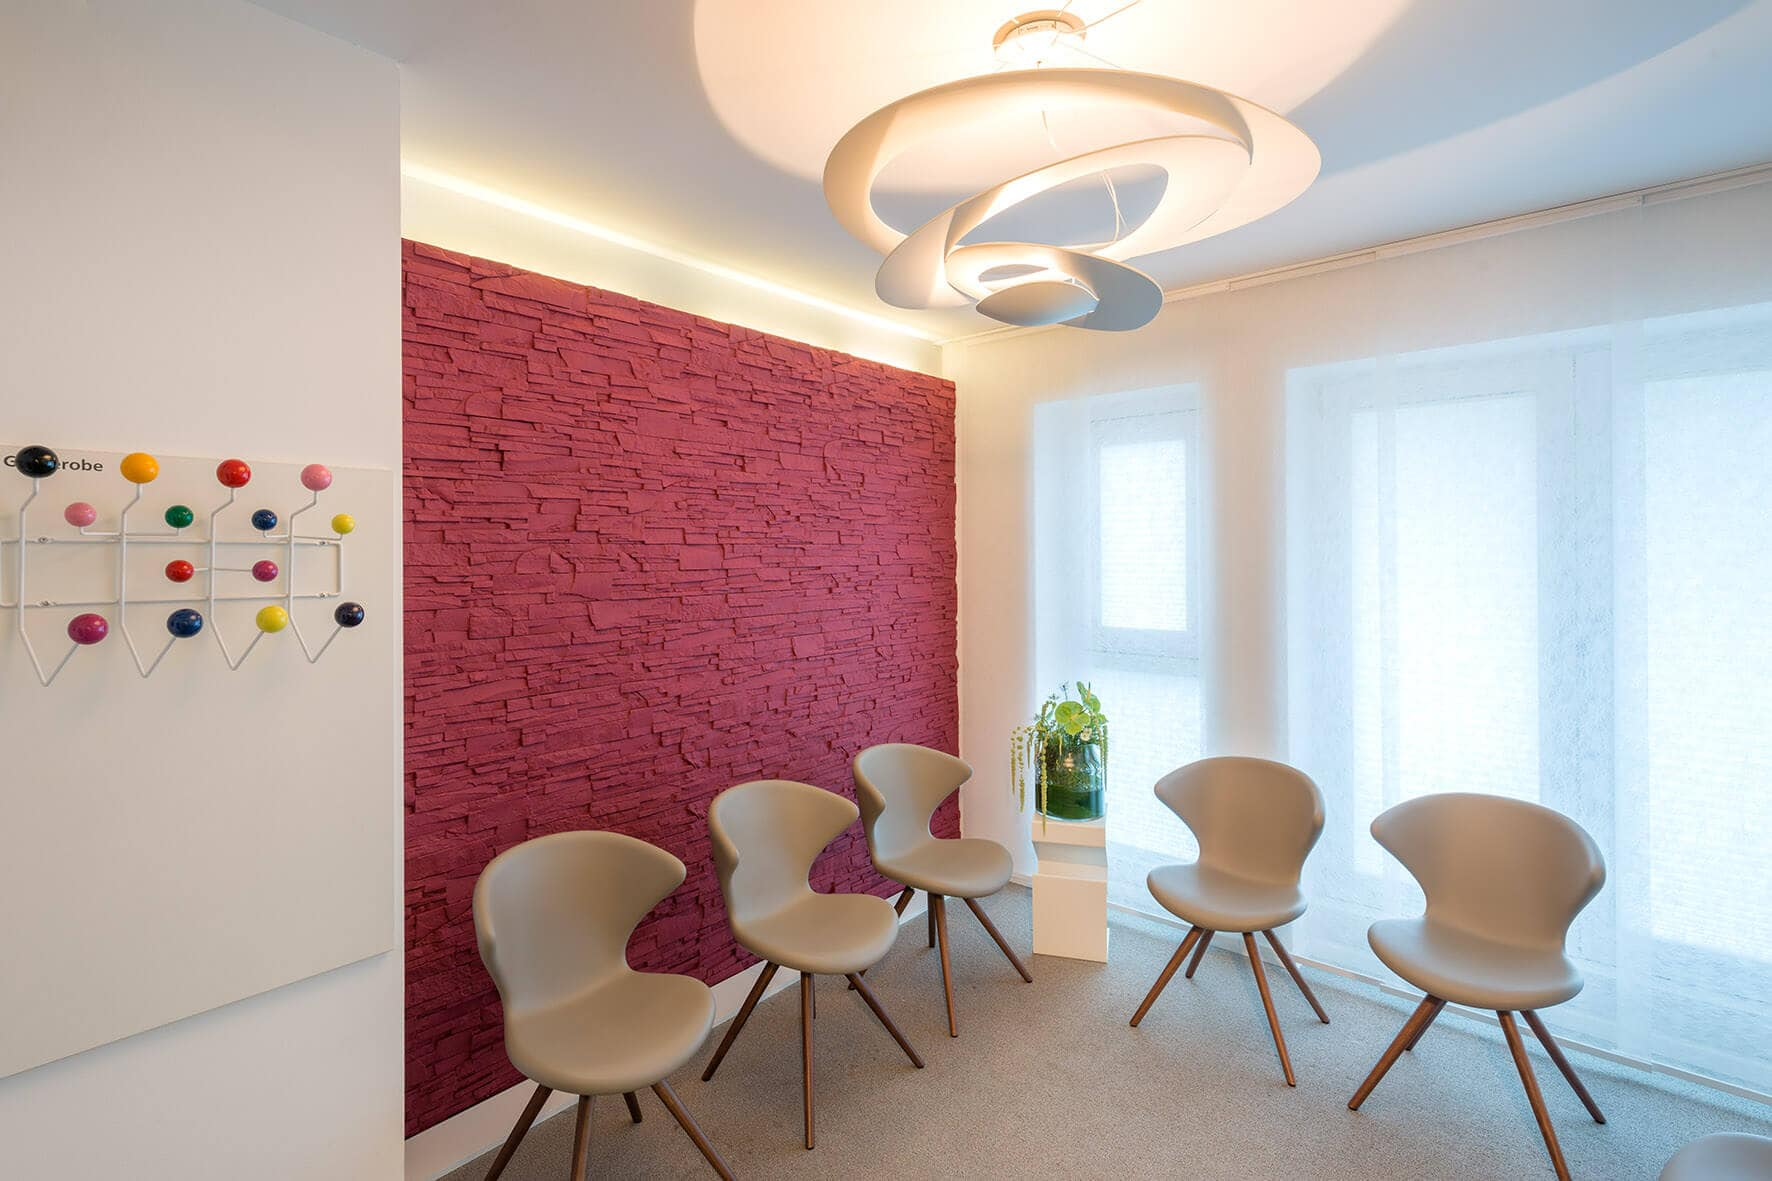 Augenarzt Baden-Baden (Dr. König / Dr. Wißmann): Praxisräume - Wartezimmer 1. OG